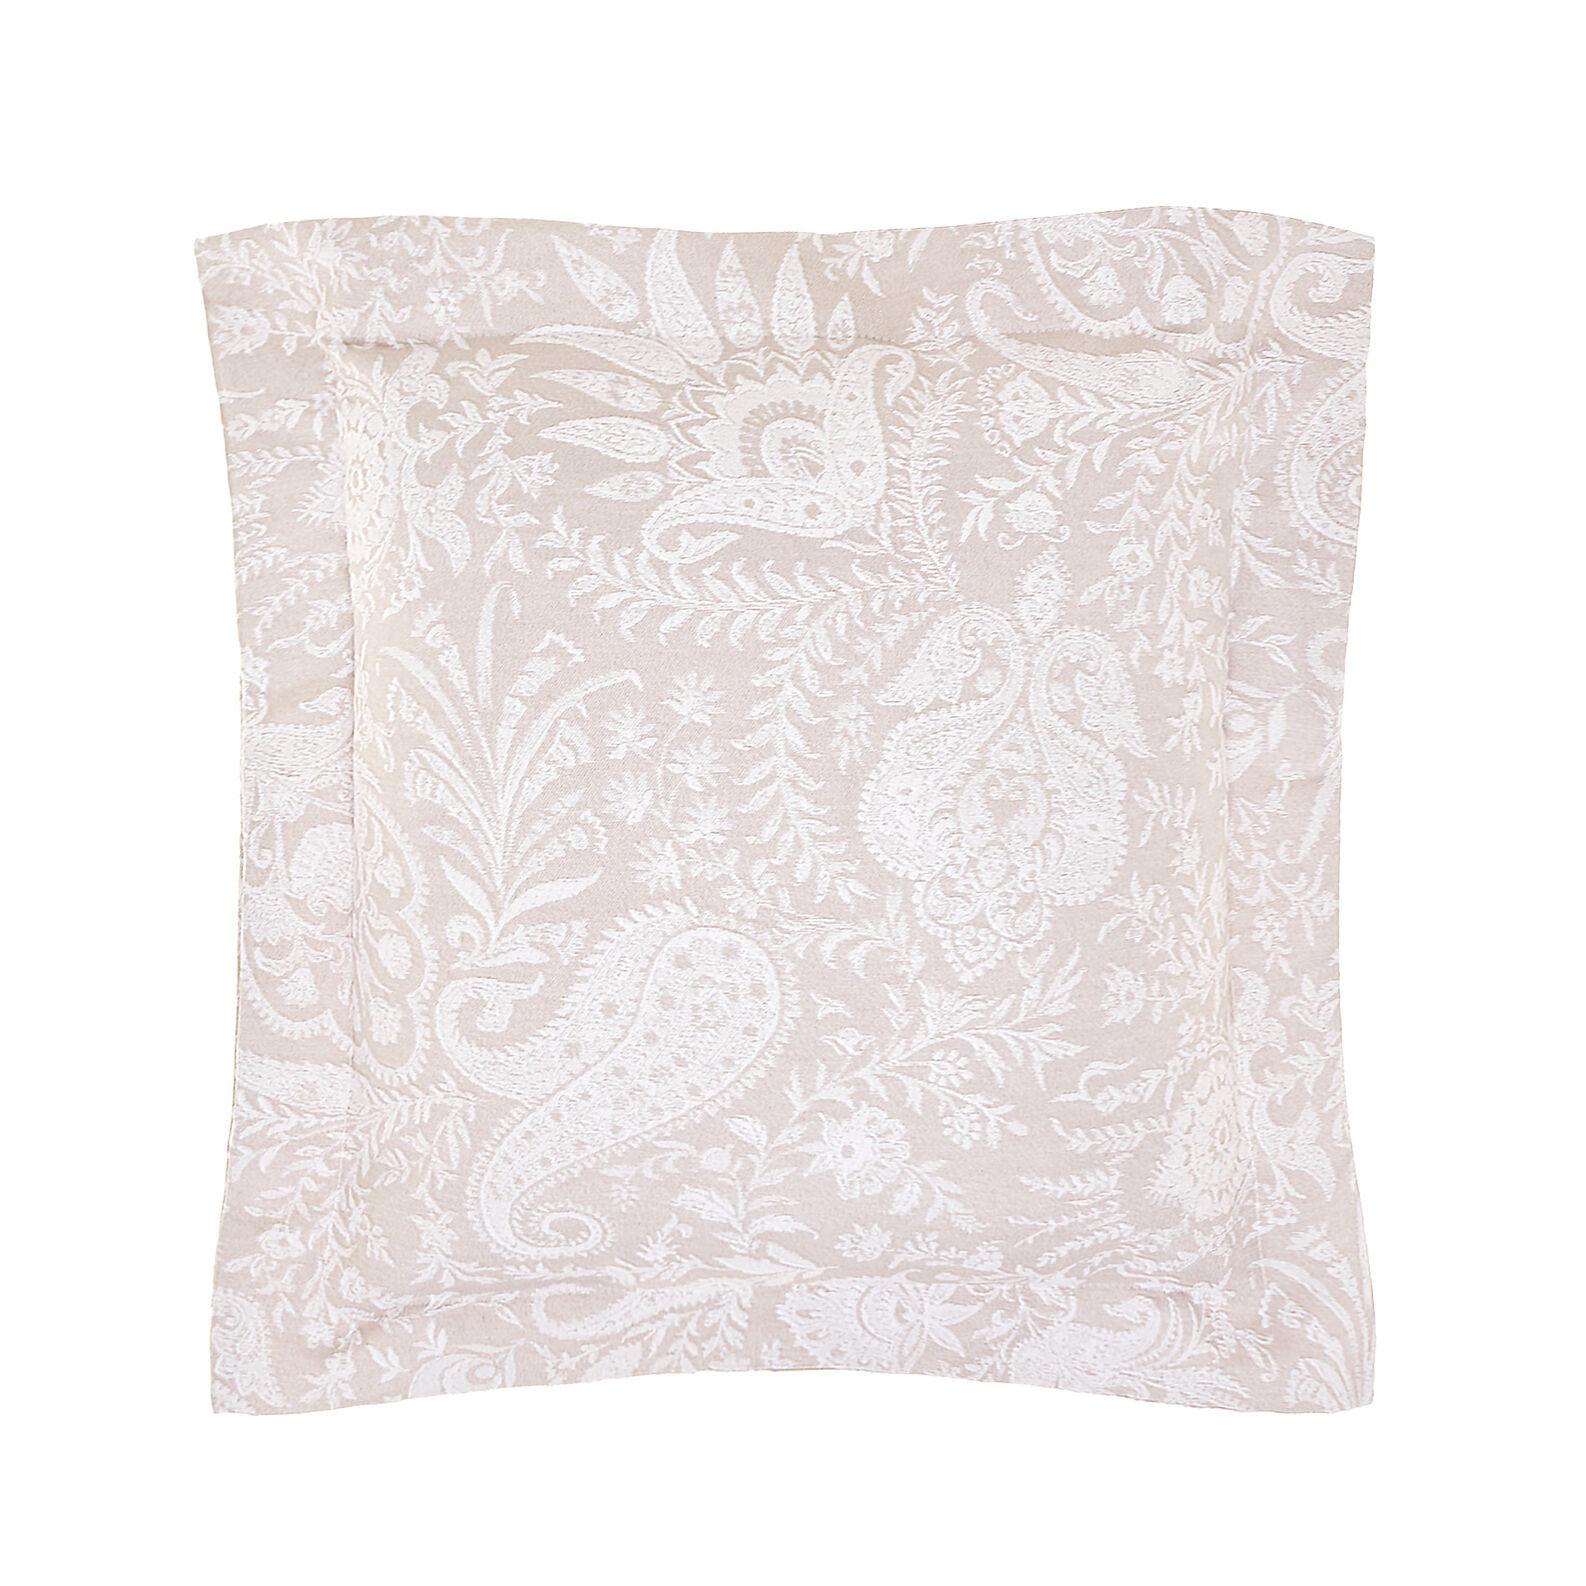 Portofino cushion with paisley pattern